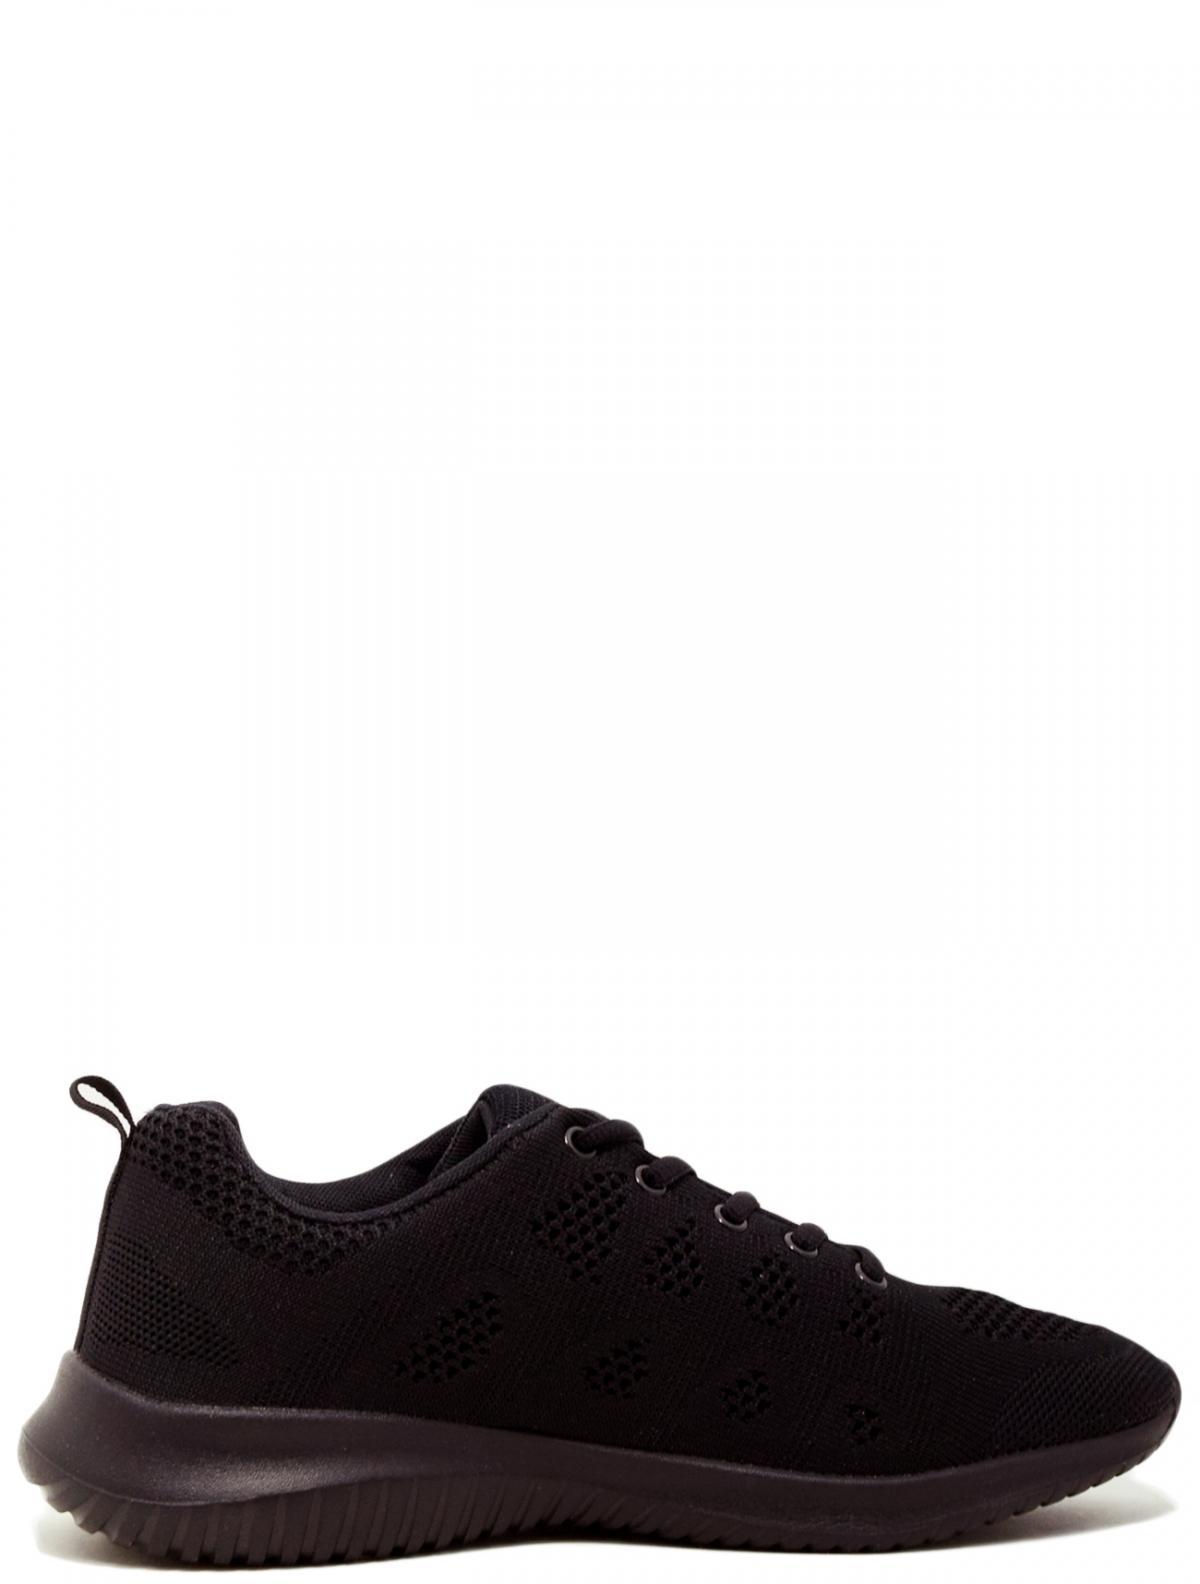 Trien JSZ-19002 мужские кроссовки